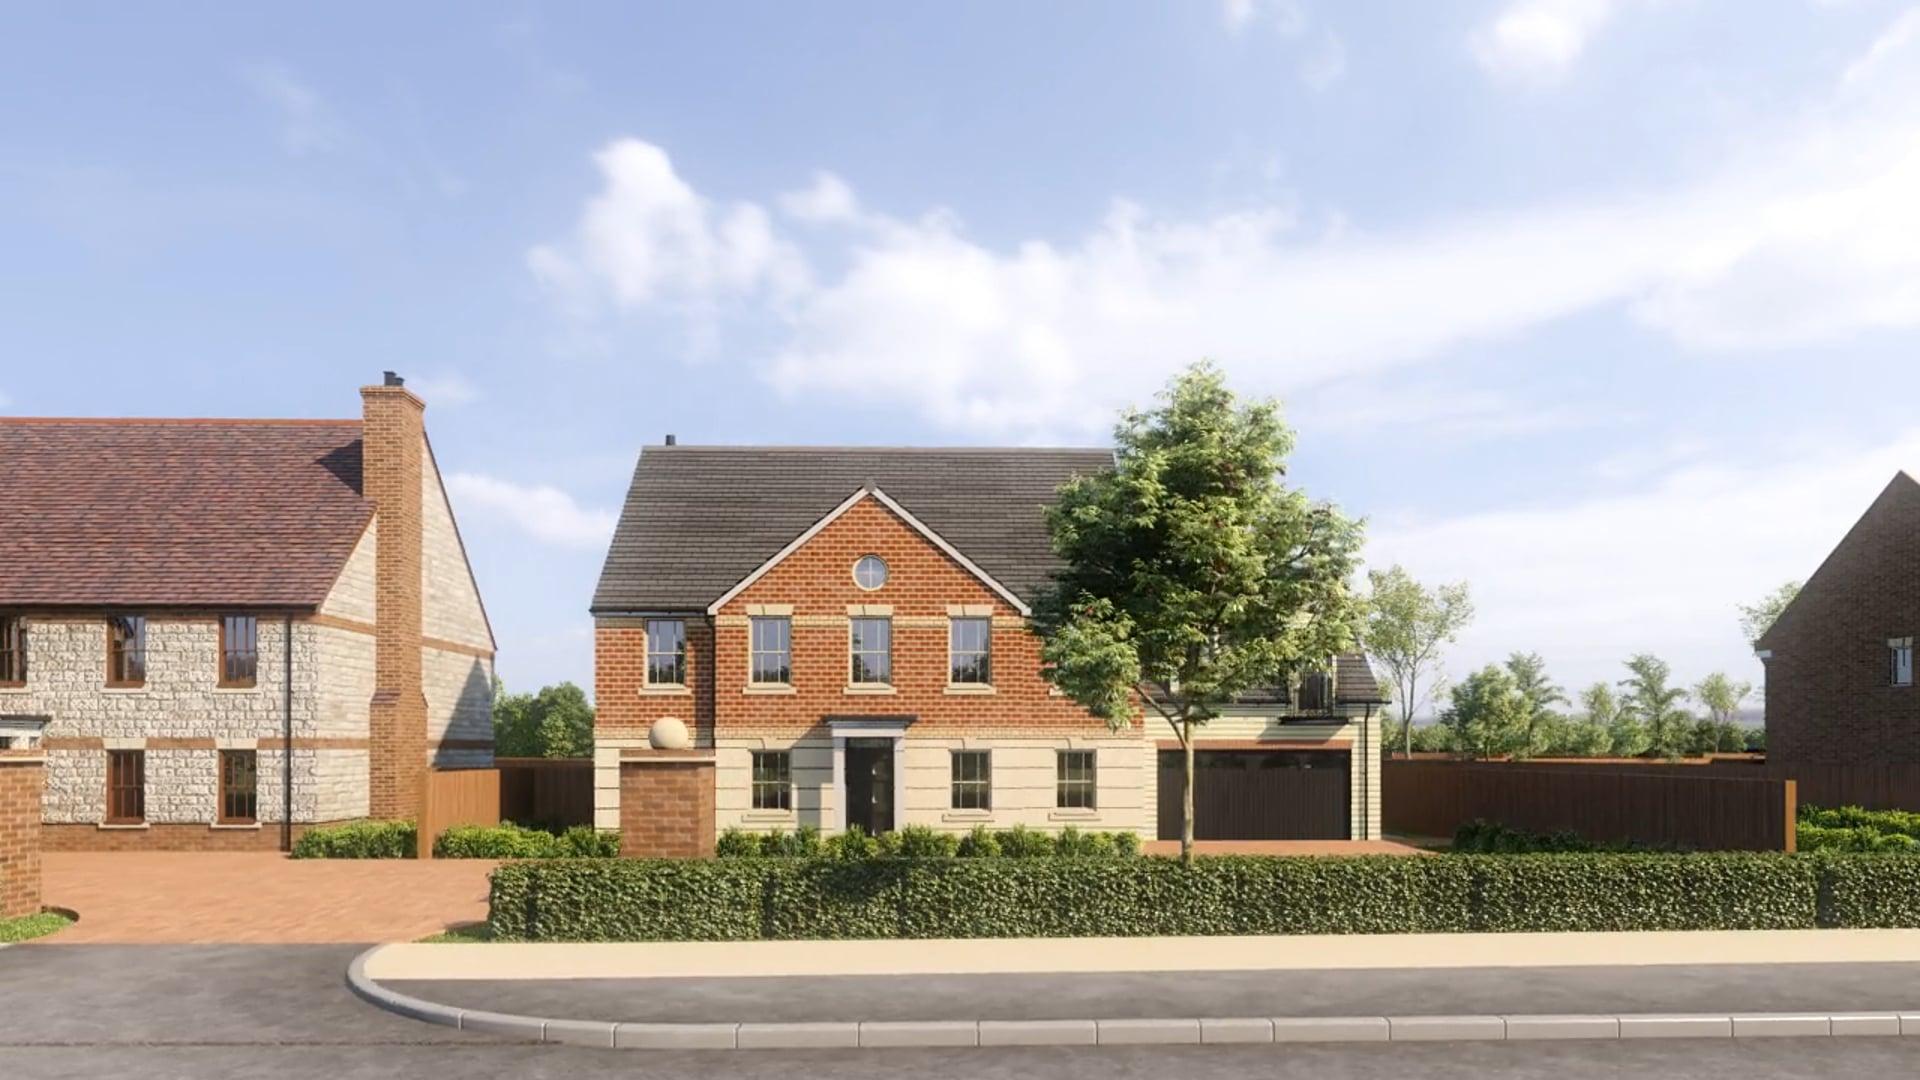 (Developer/architect/estate agent) Handley Chase, by Balfe T Construction